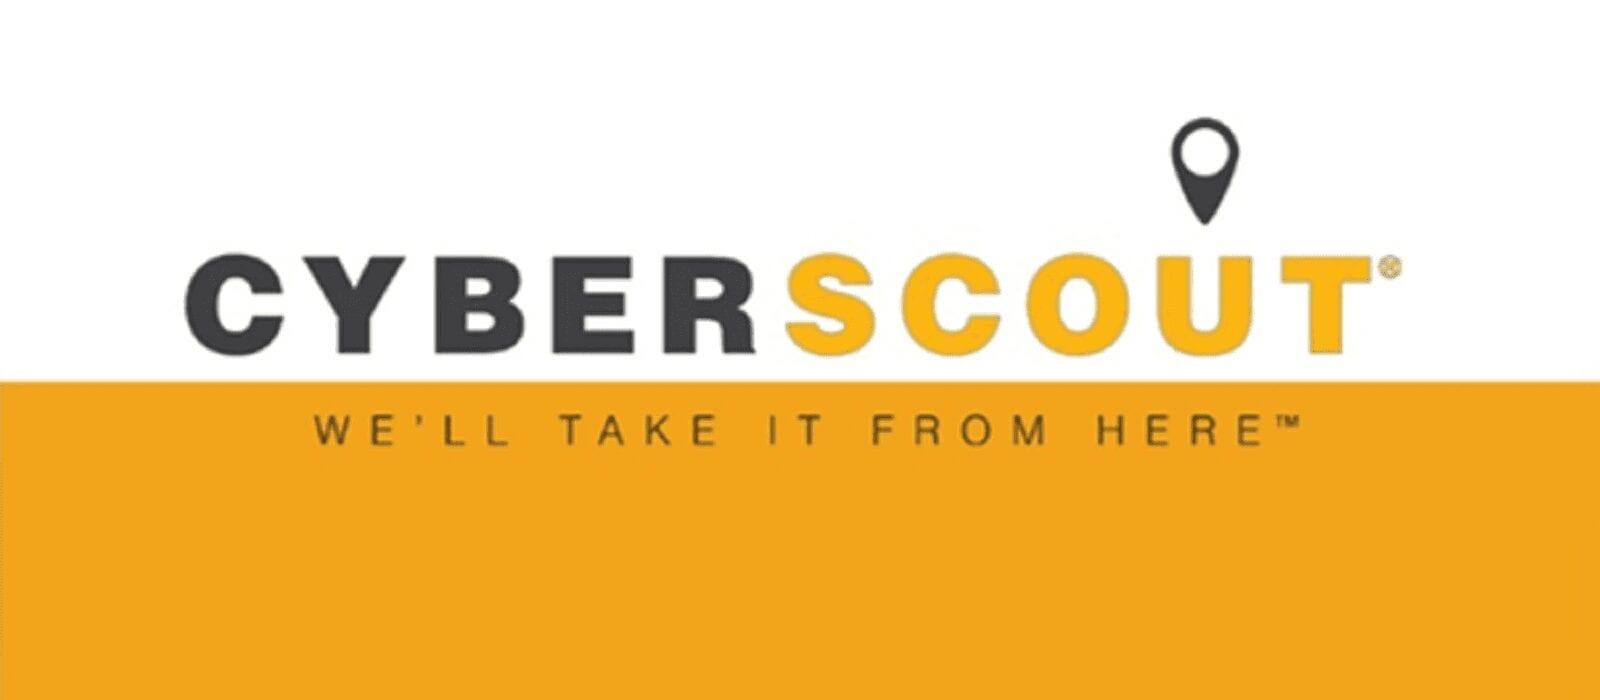 cyberscout